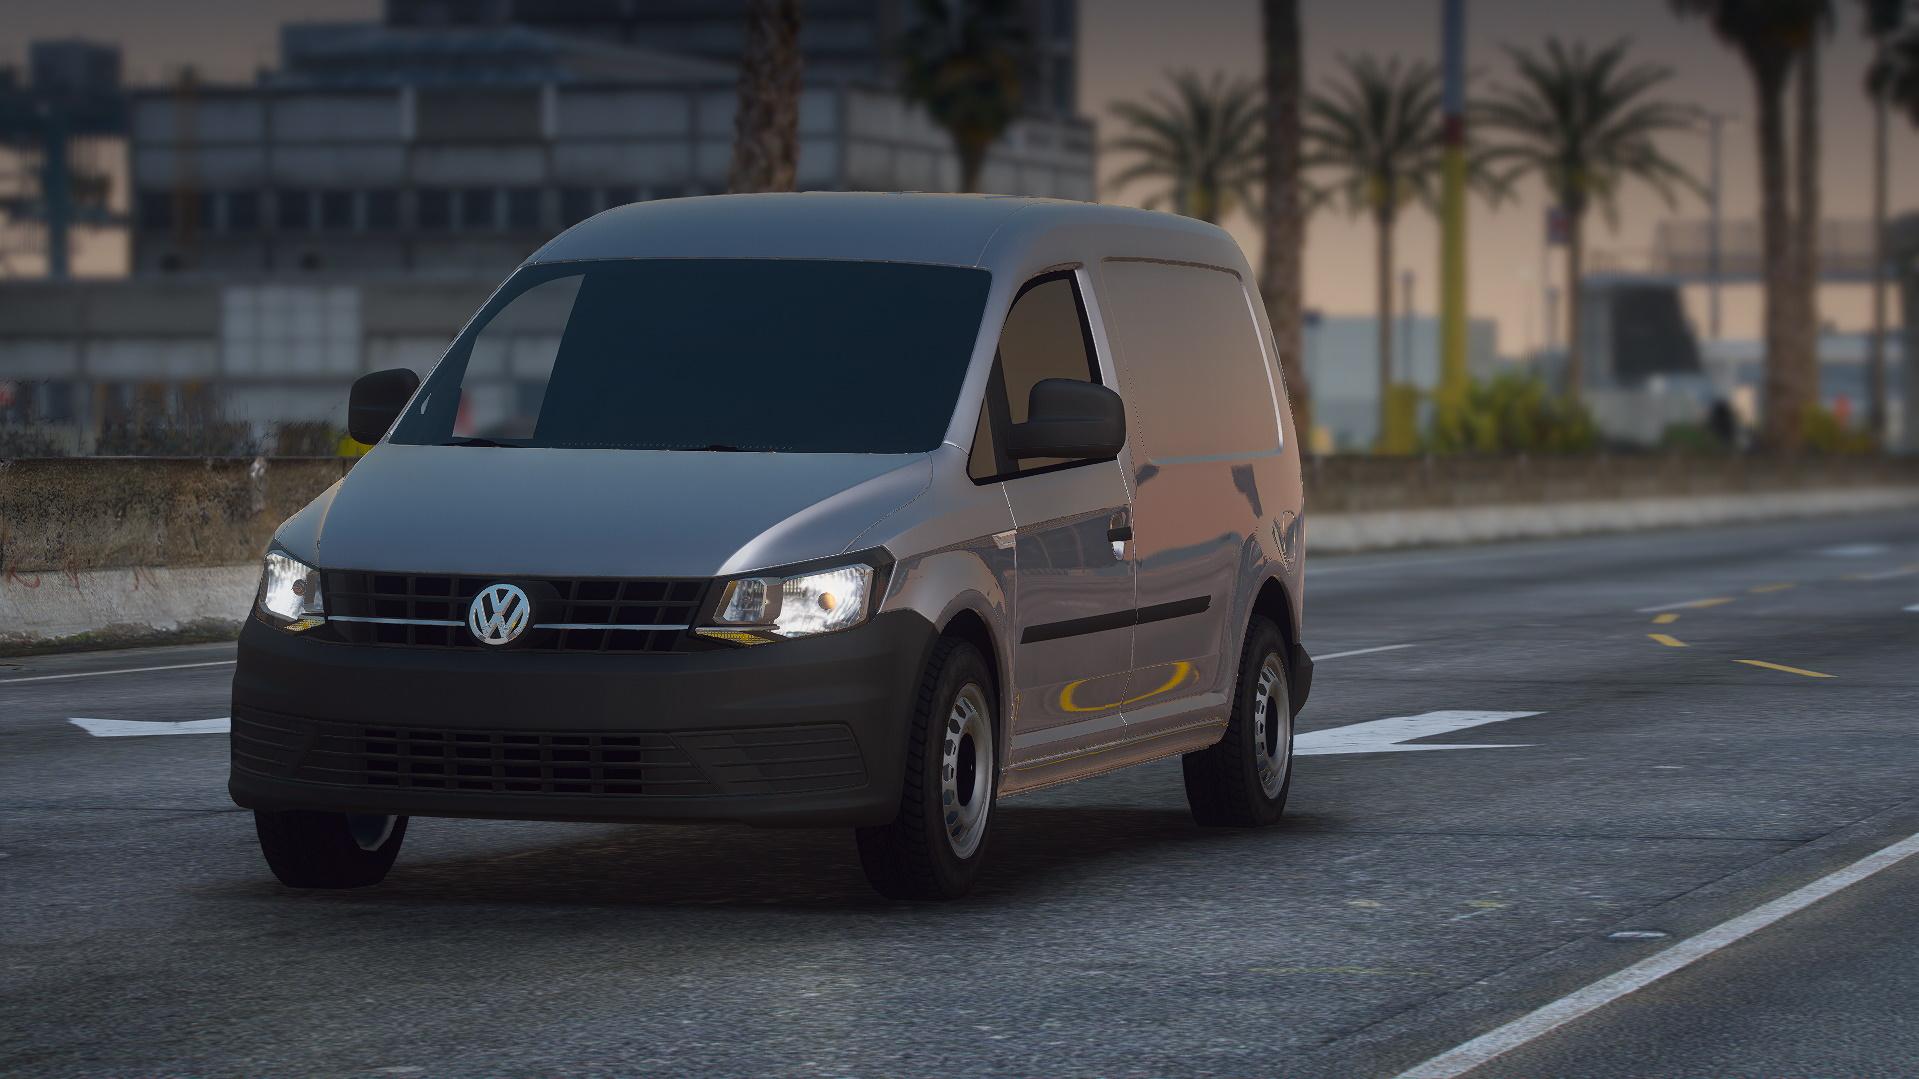 Volkswagen Caddy Maxi 2016 [Add-On | Unlocked] 1.0